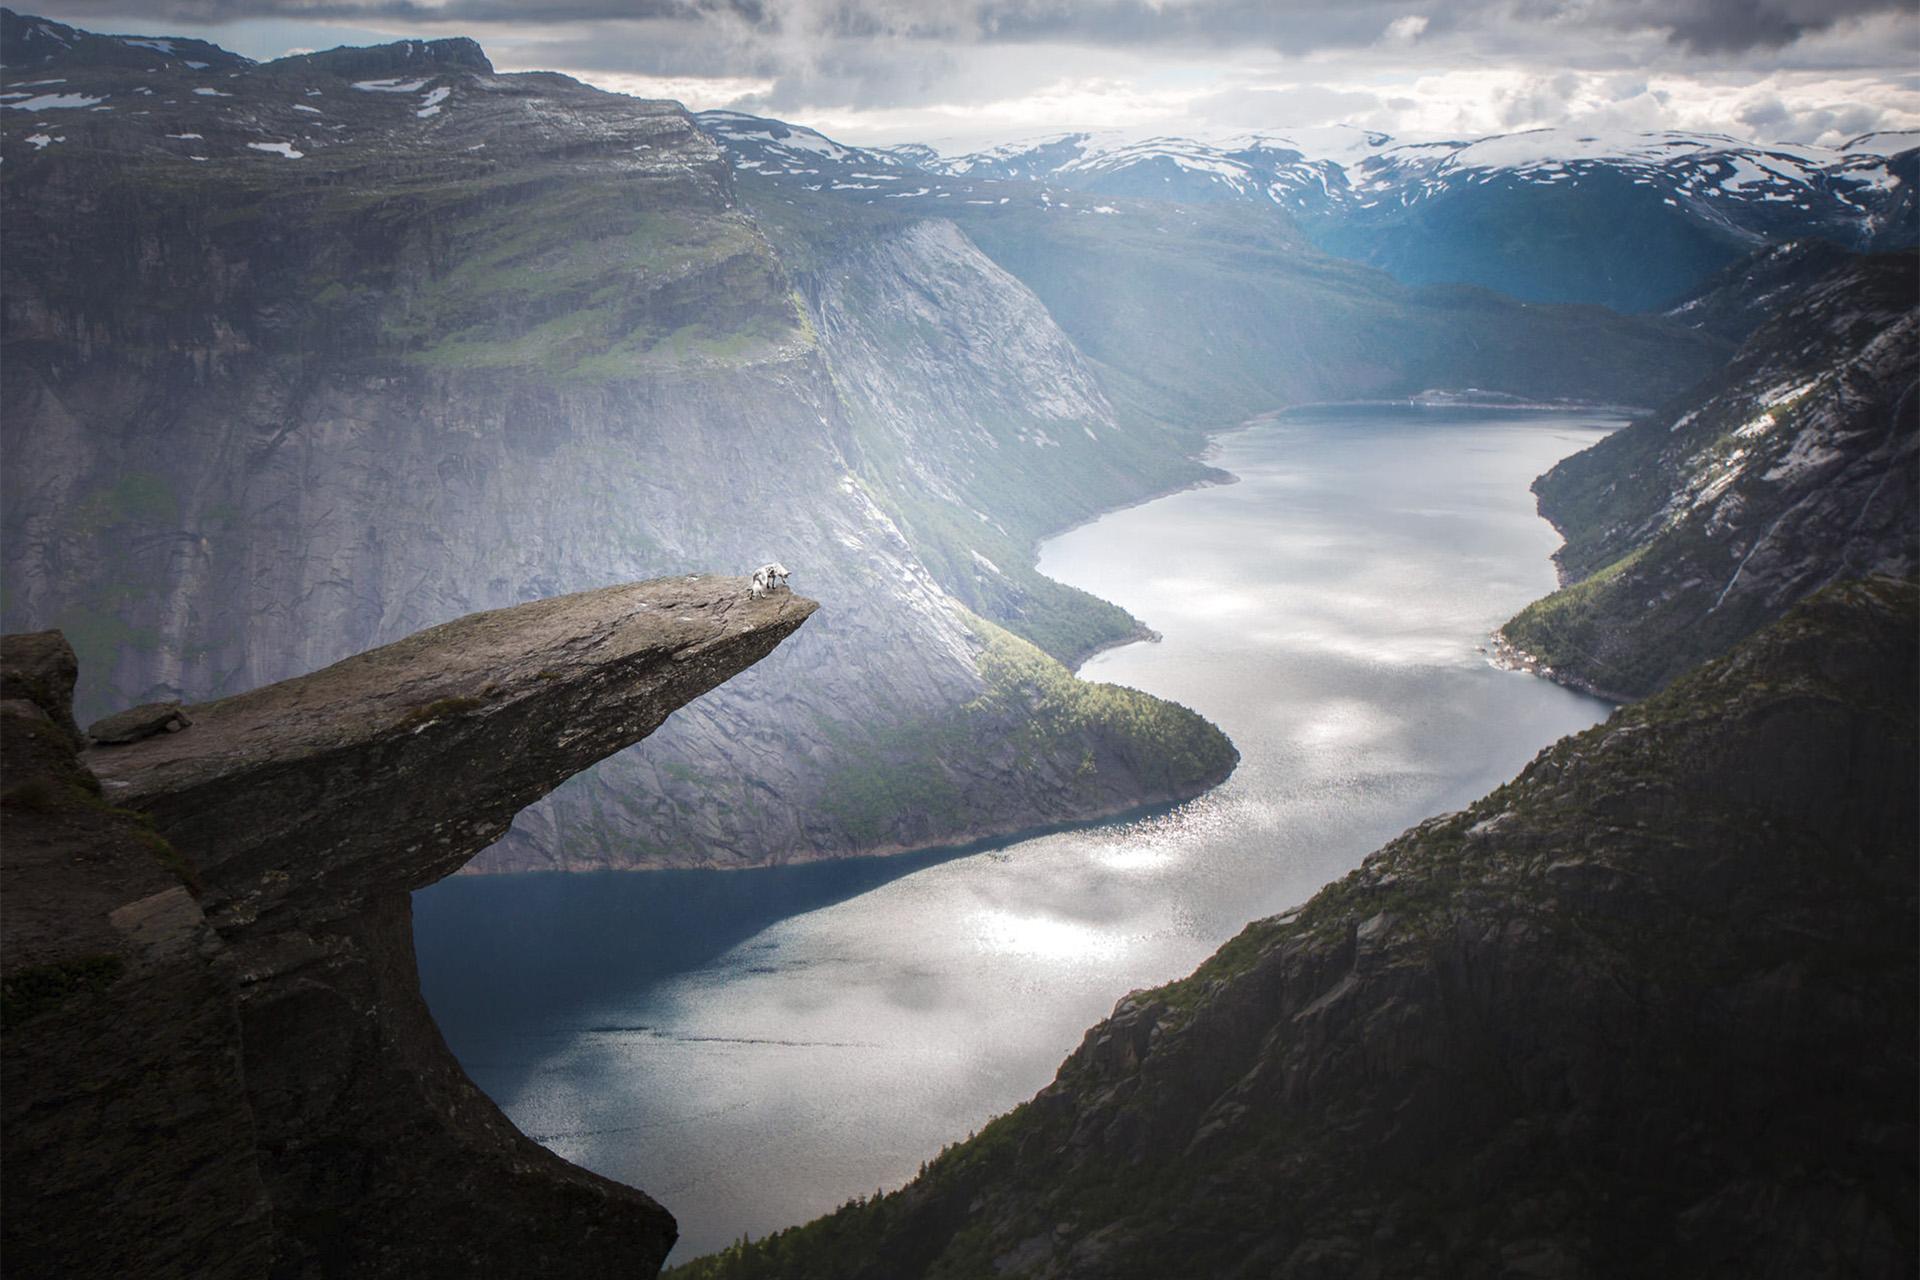 Collie_fjord_cliff